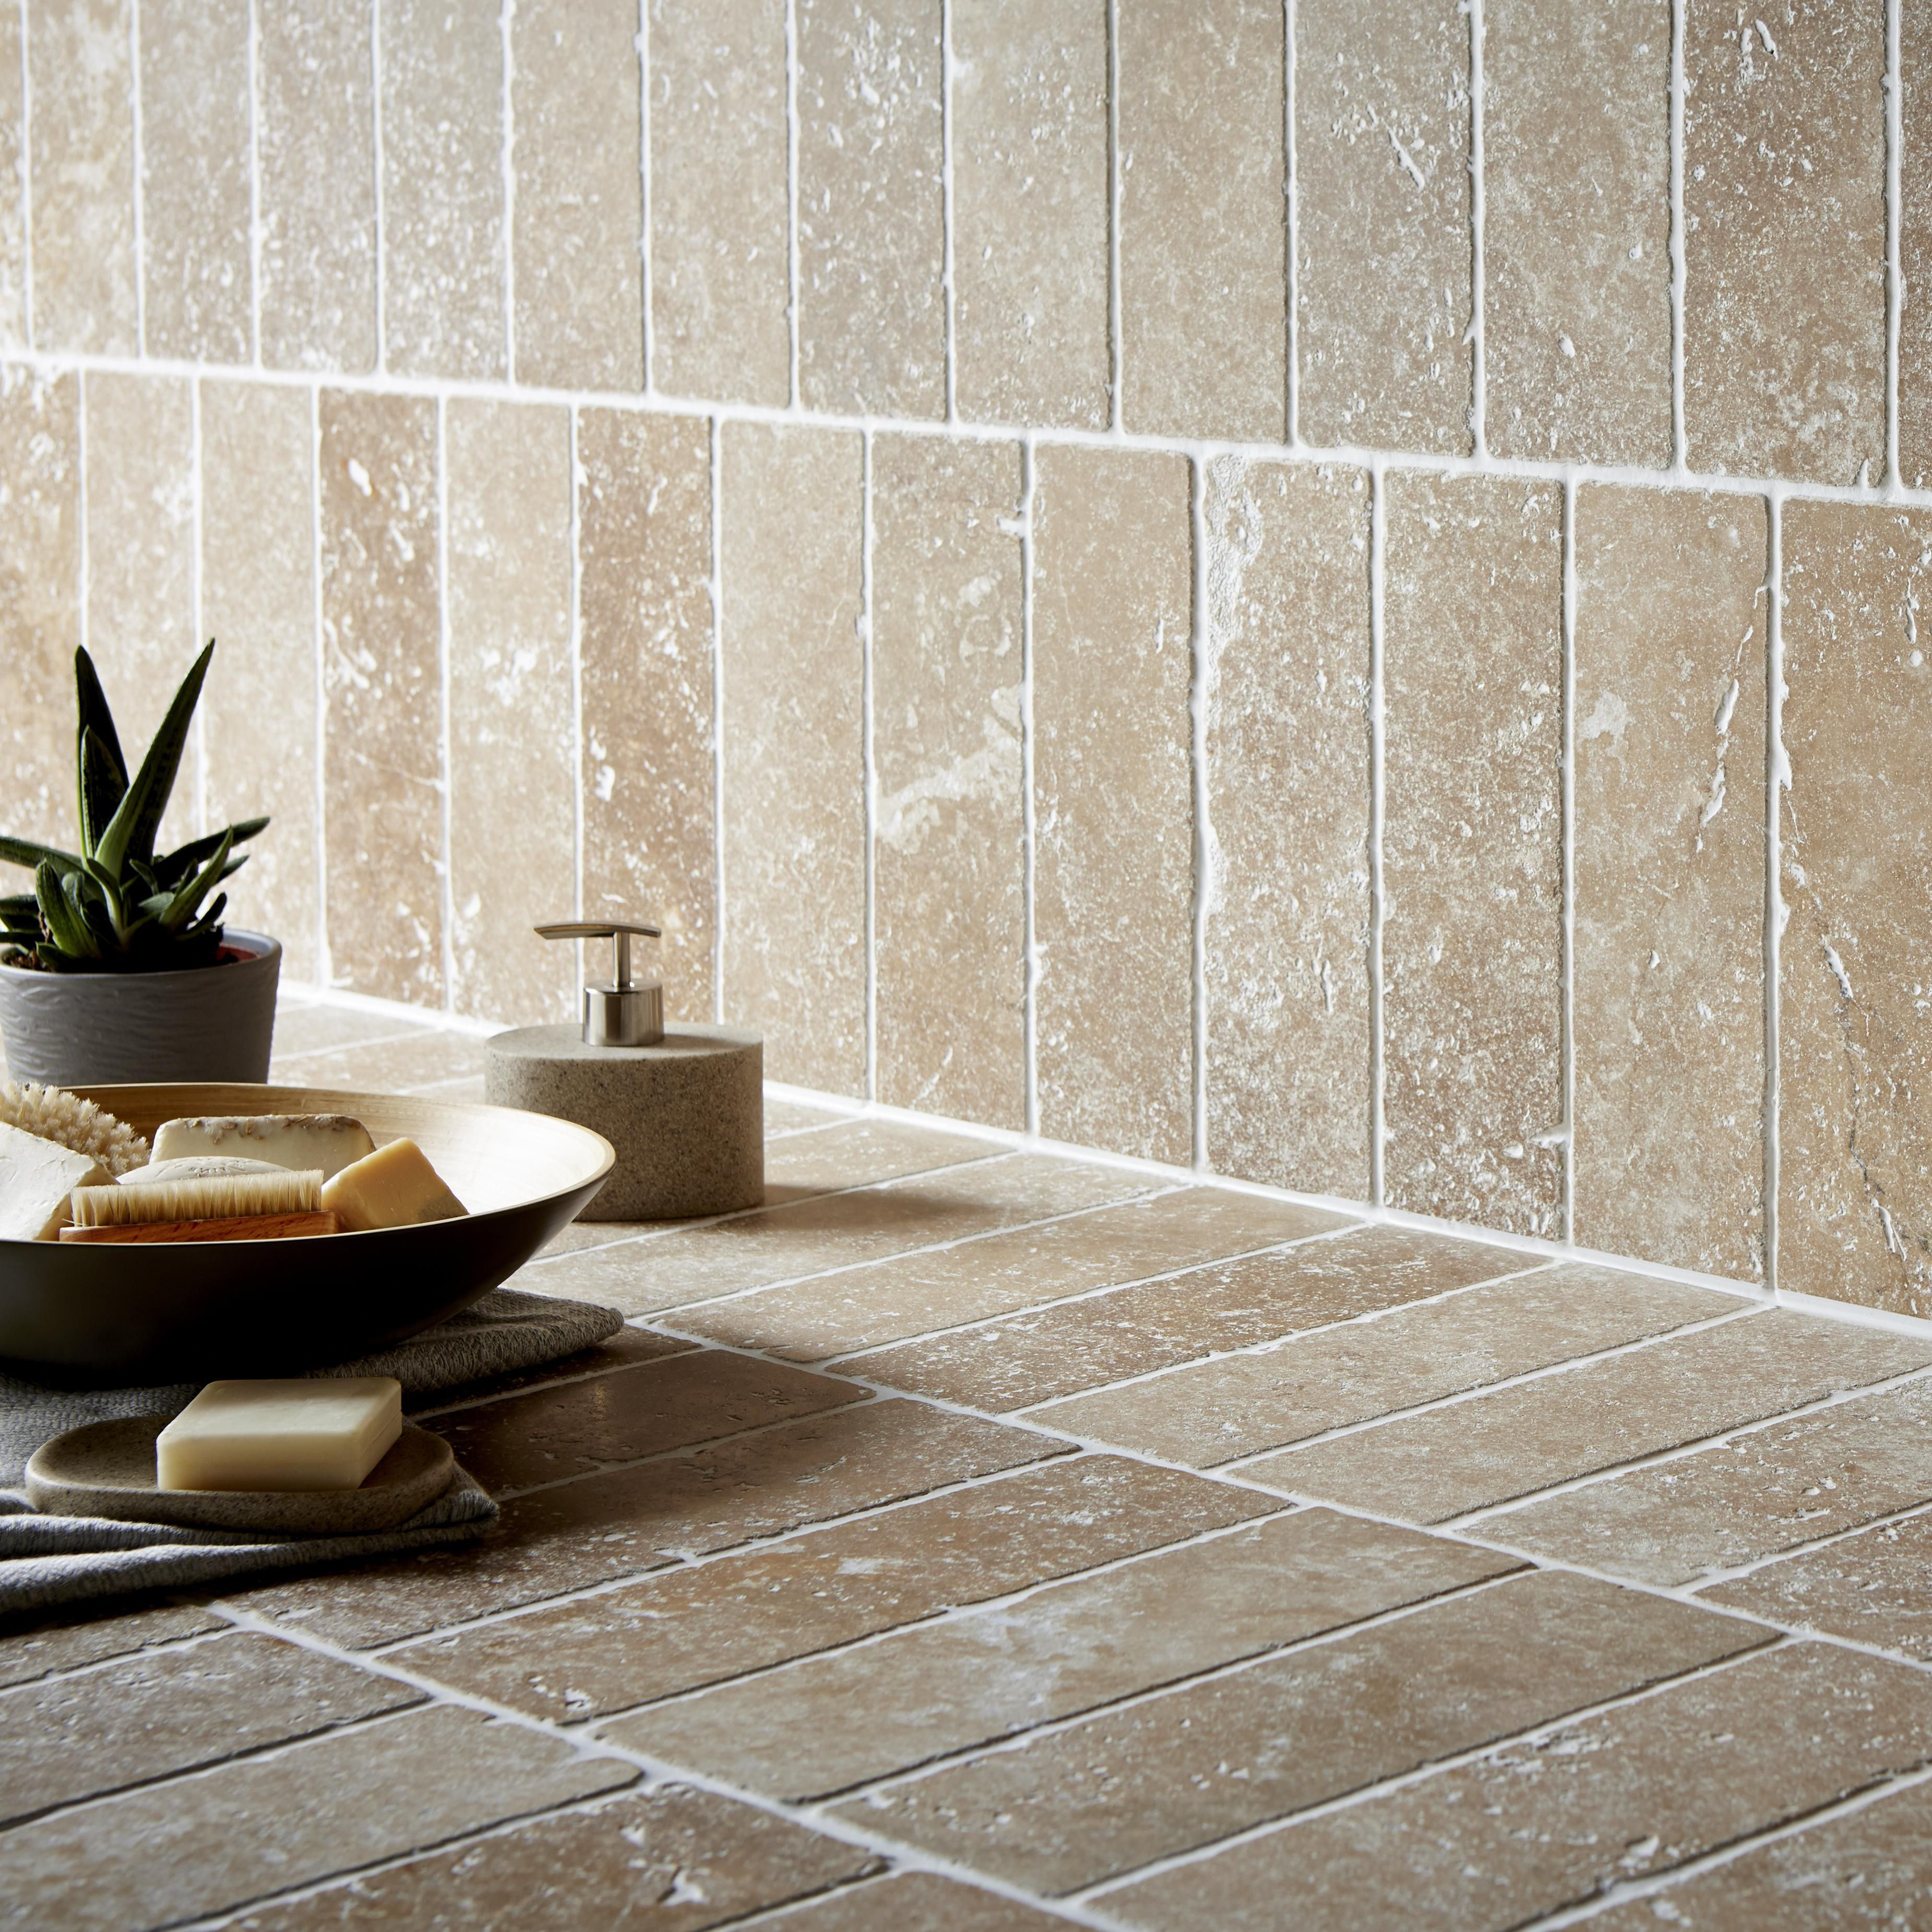 Natural Travertine Mosaic Tile L 300mm W 300mm: DIY At B&Q